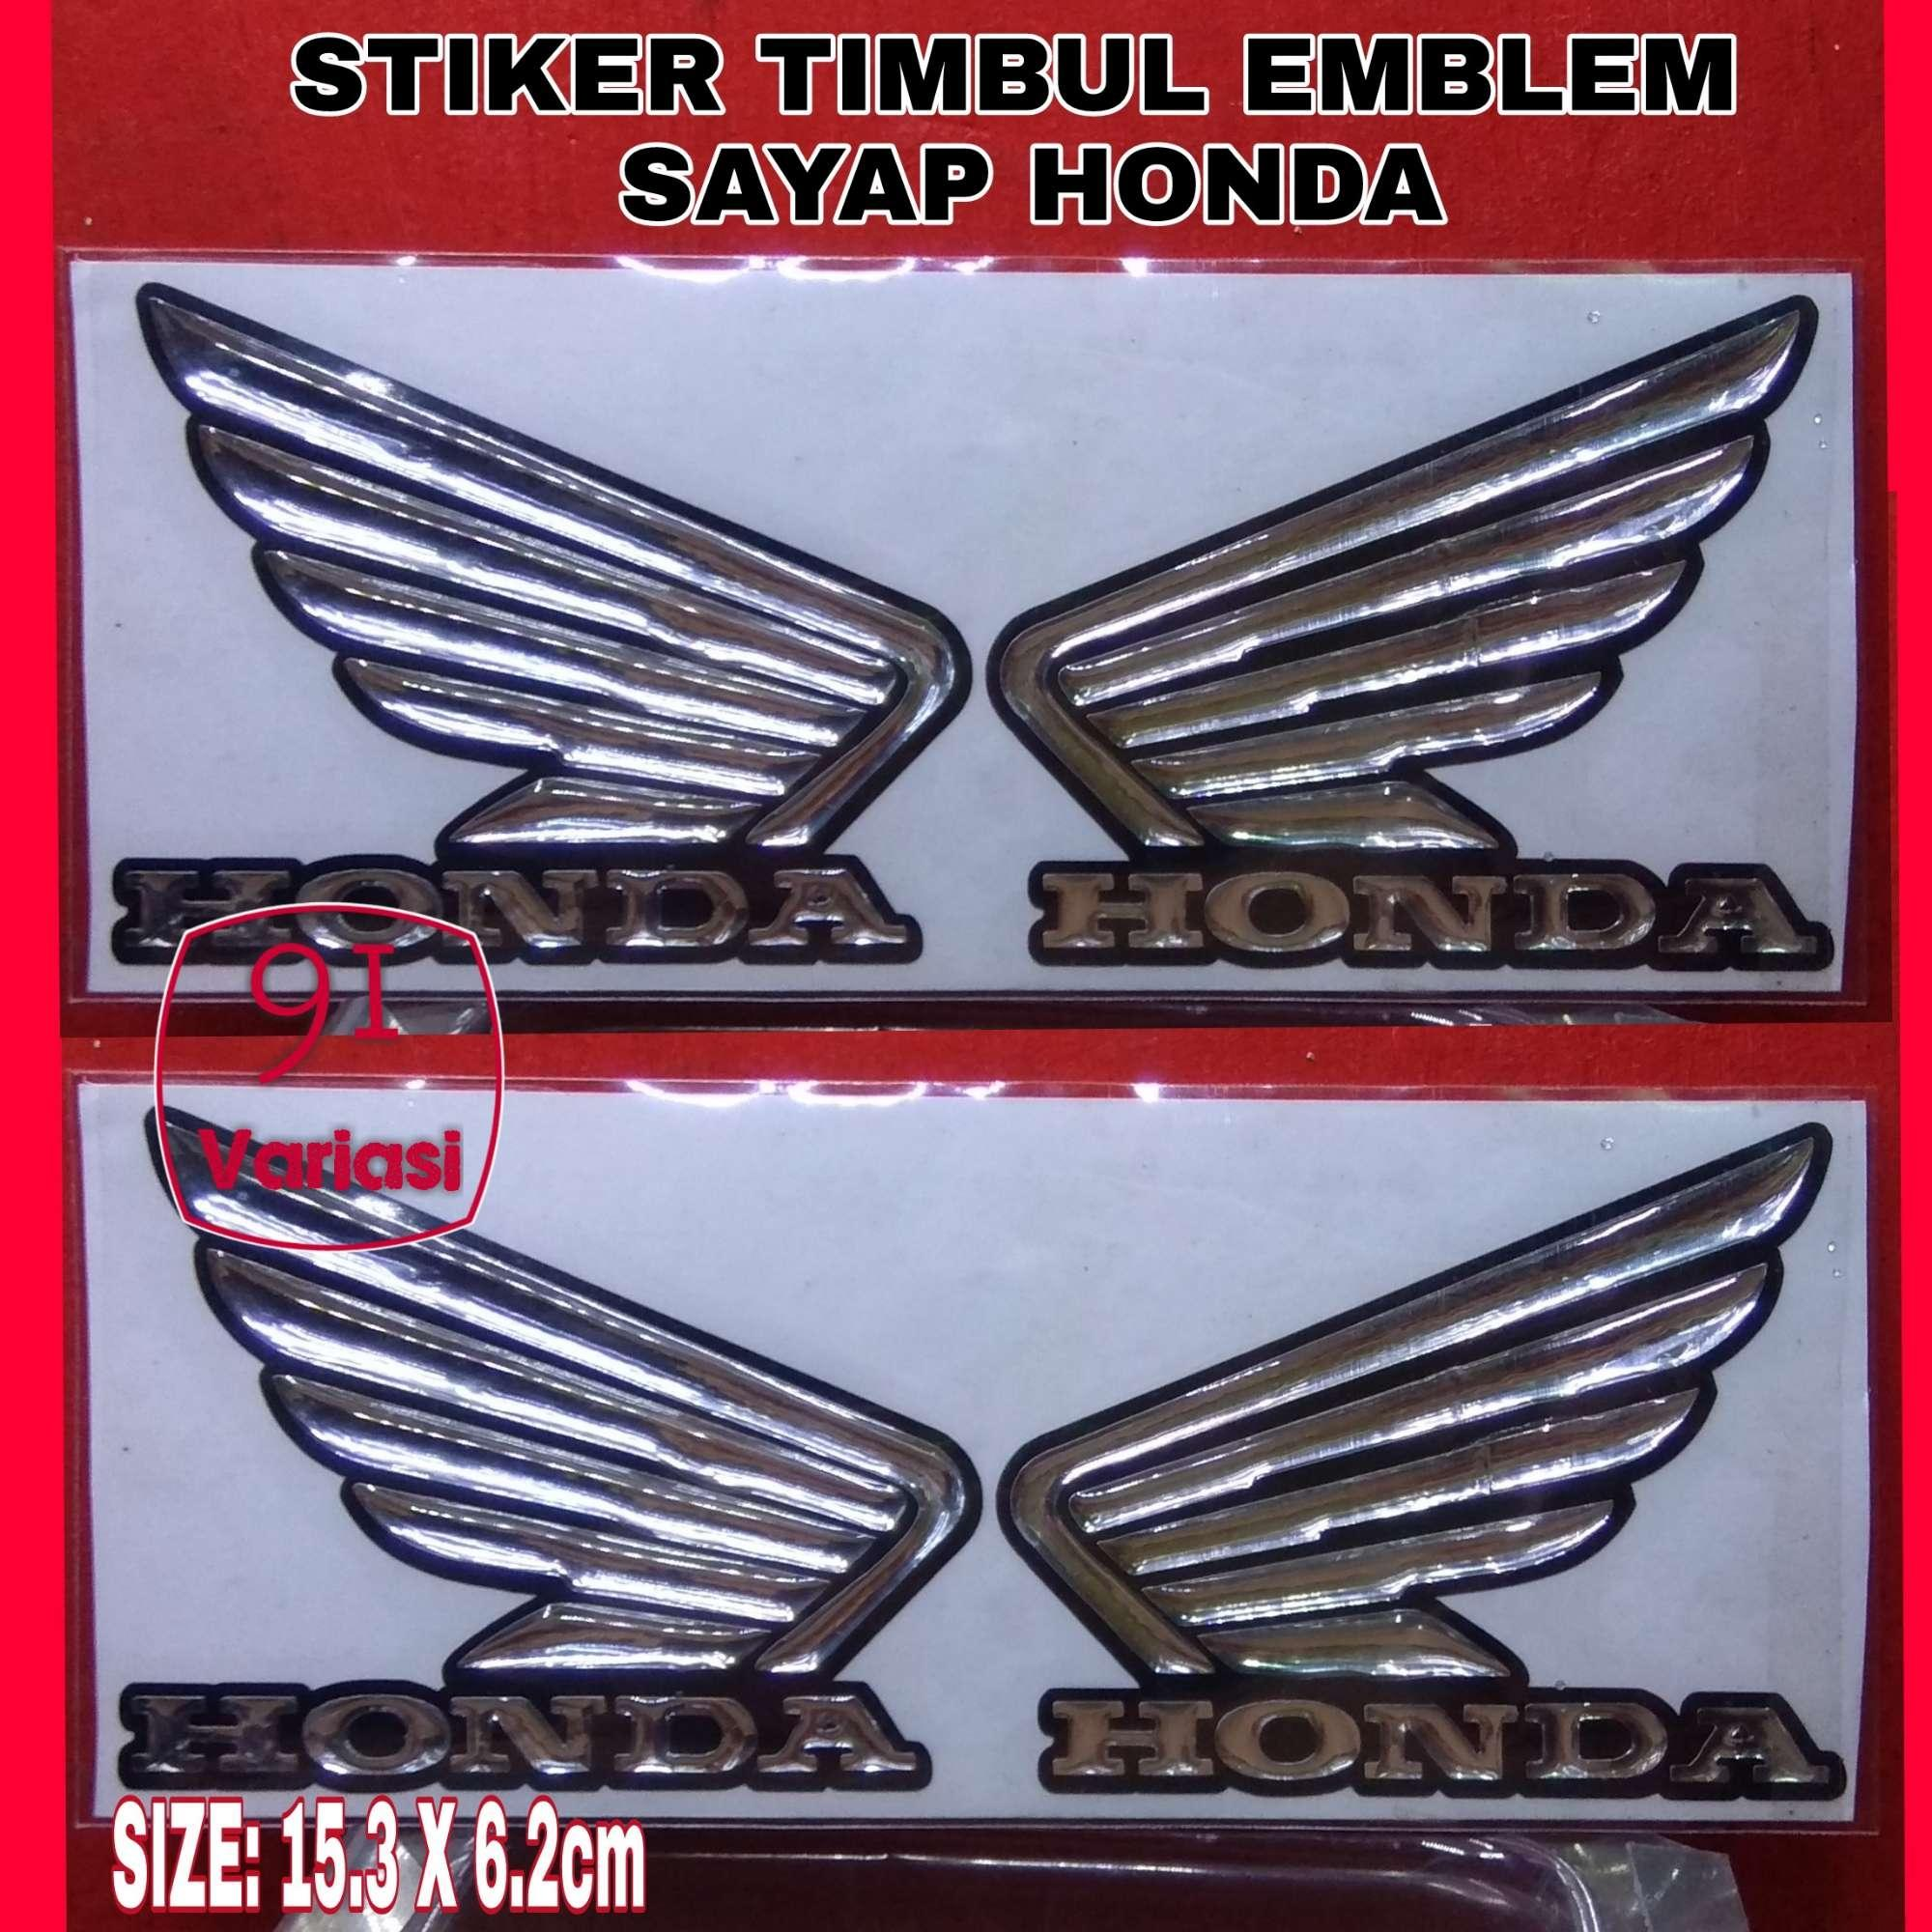 Aksesoris Stiker Logo Motor Skotlet Scotchlite Aneka Warna Timbul Emblem Sayap Honda Vario Beat Pcx Cbr Krom